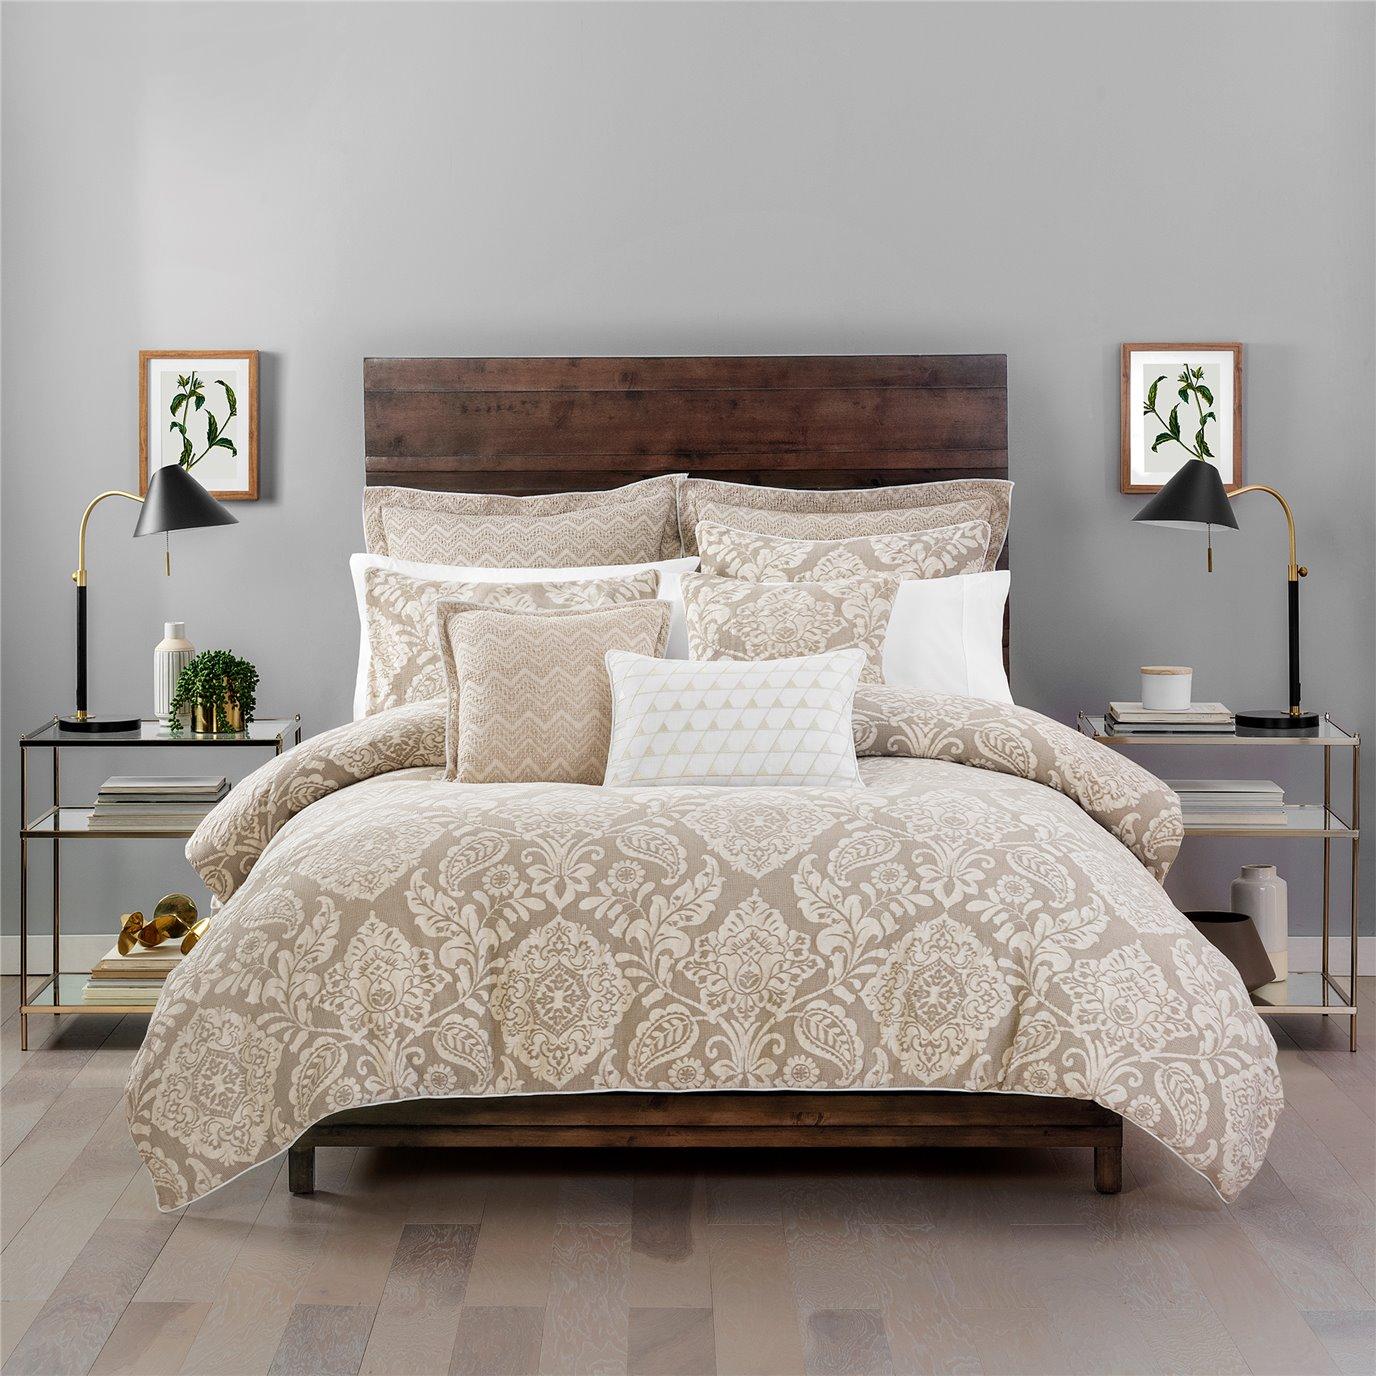 Croscill Grace King 3PC Comforter Set